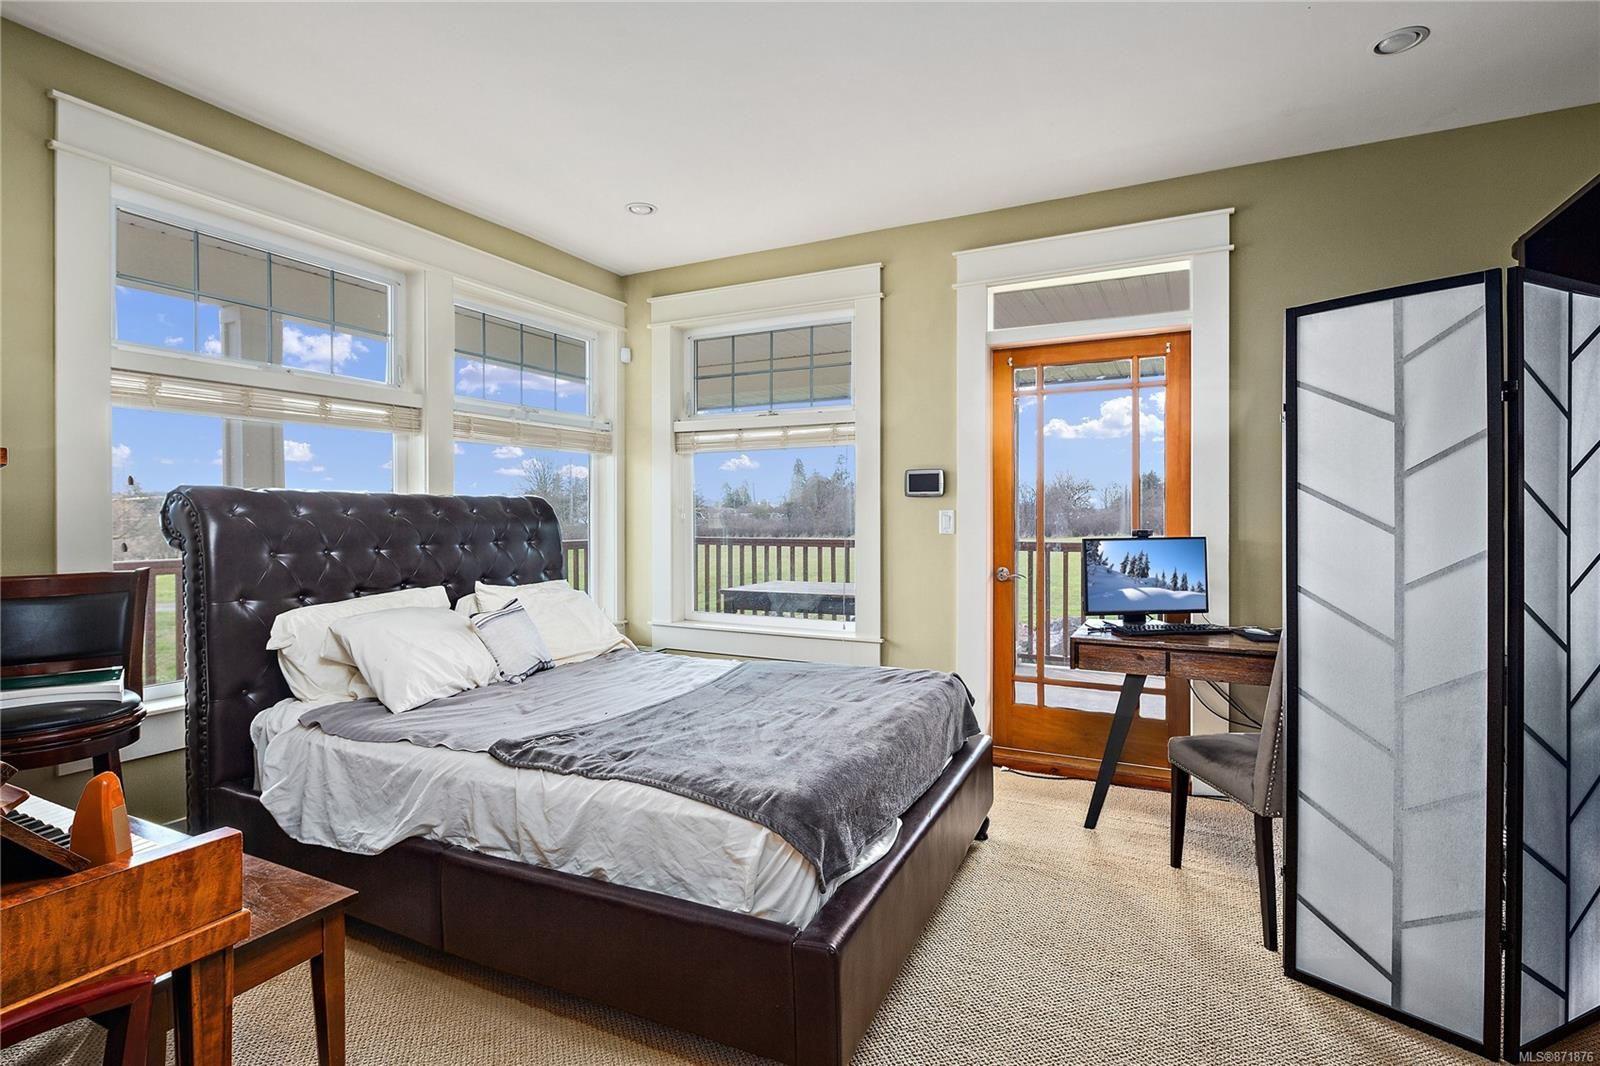 Photo 16: Photos: 4420 Wilkinson Rd in : SW Royal Oak House for sale (Saanich West)  : MLS®# 871876